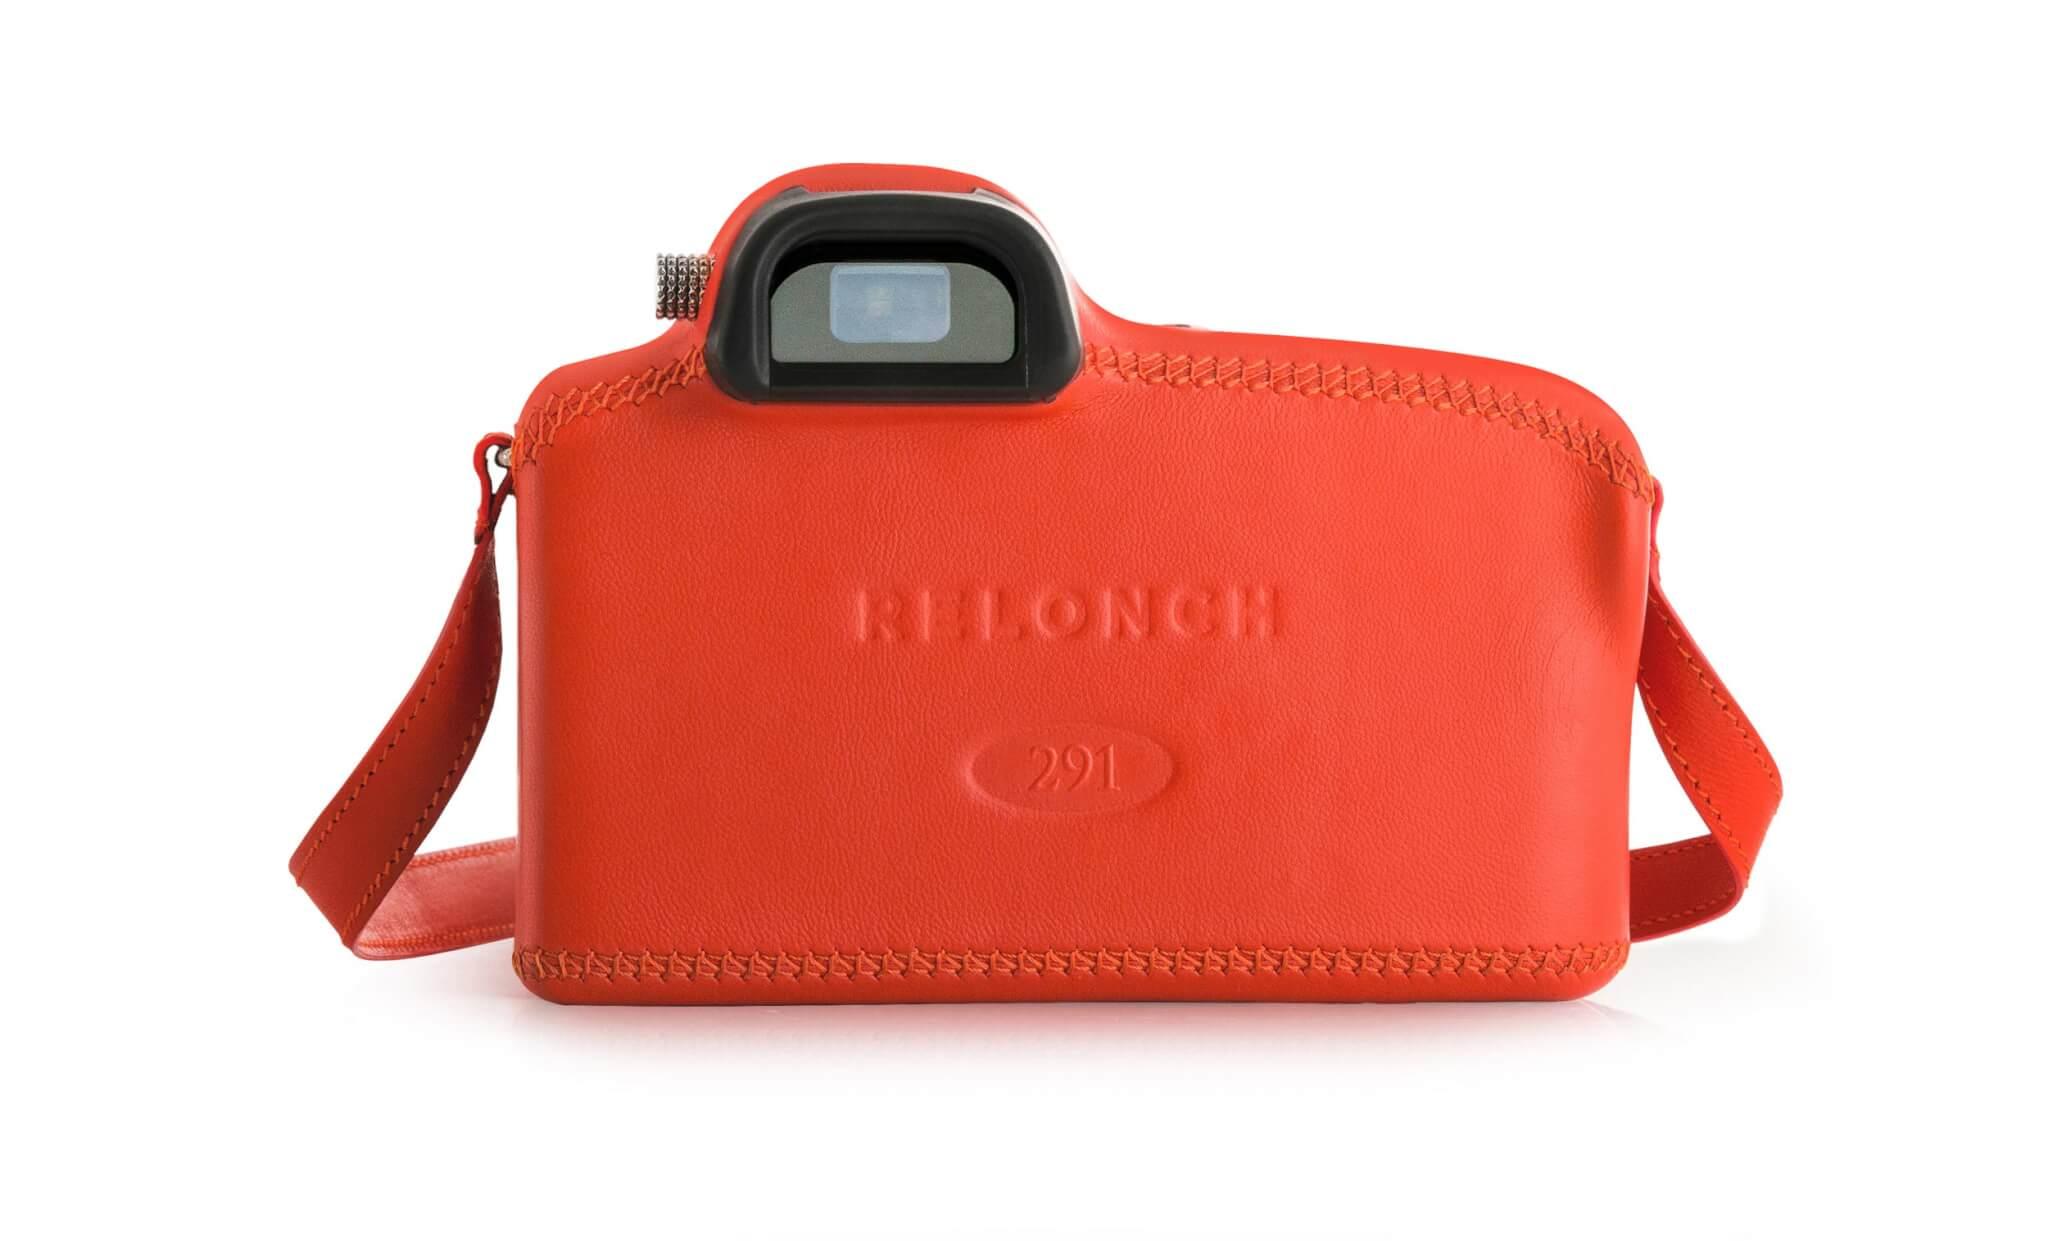 Relonch camera back